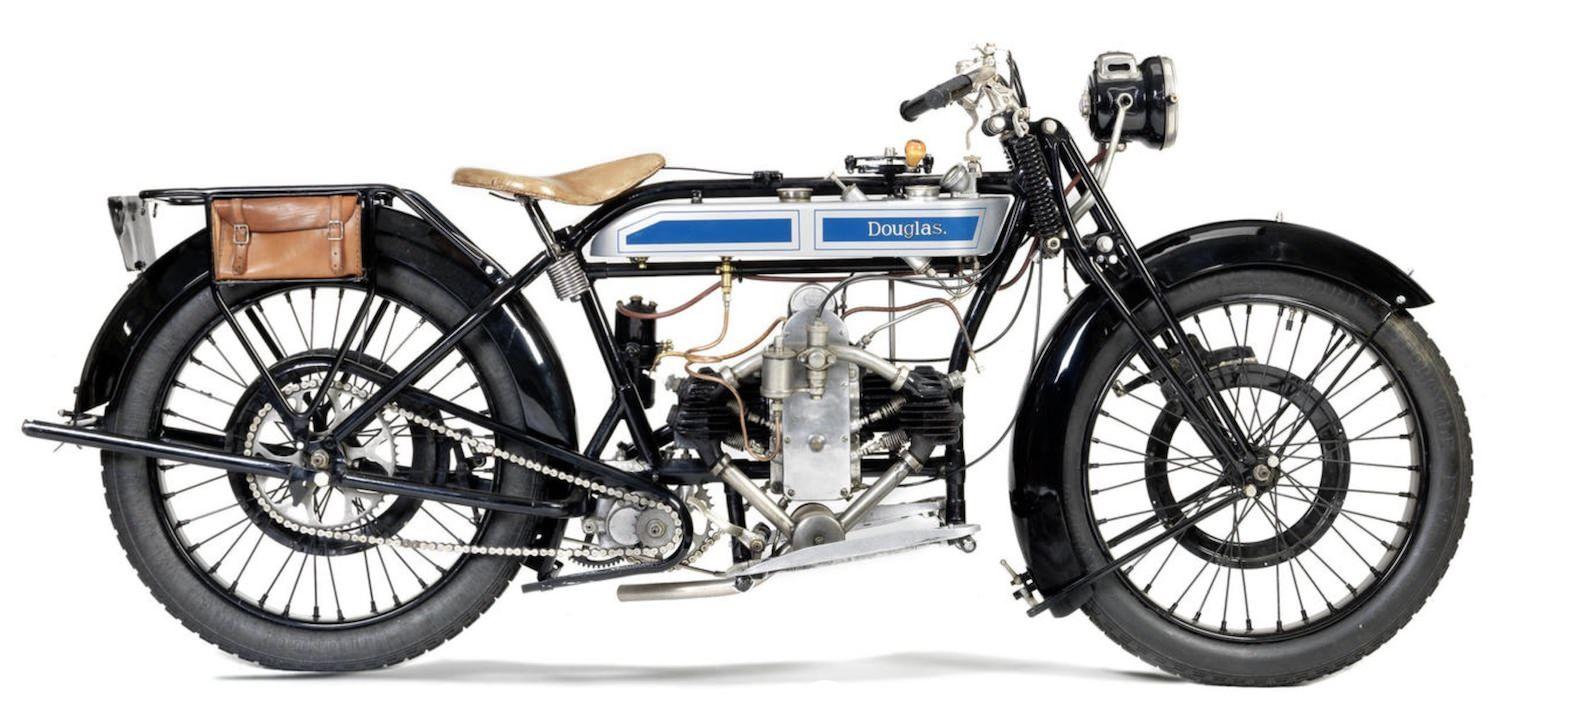 1925 Douglas 2 Hp Vintage Motorcycle Classic Motorcycles Motorcycle